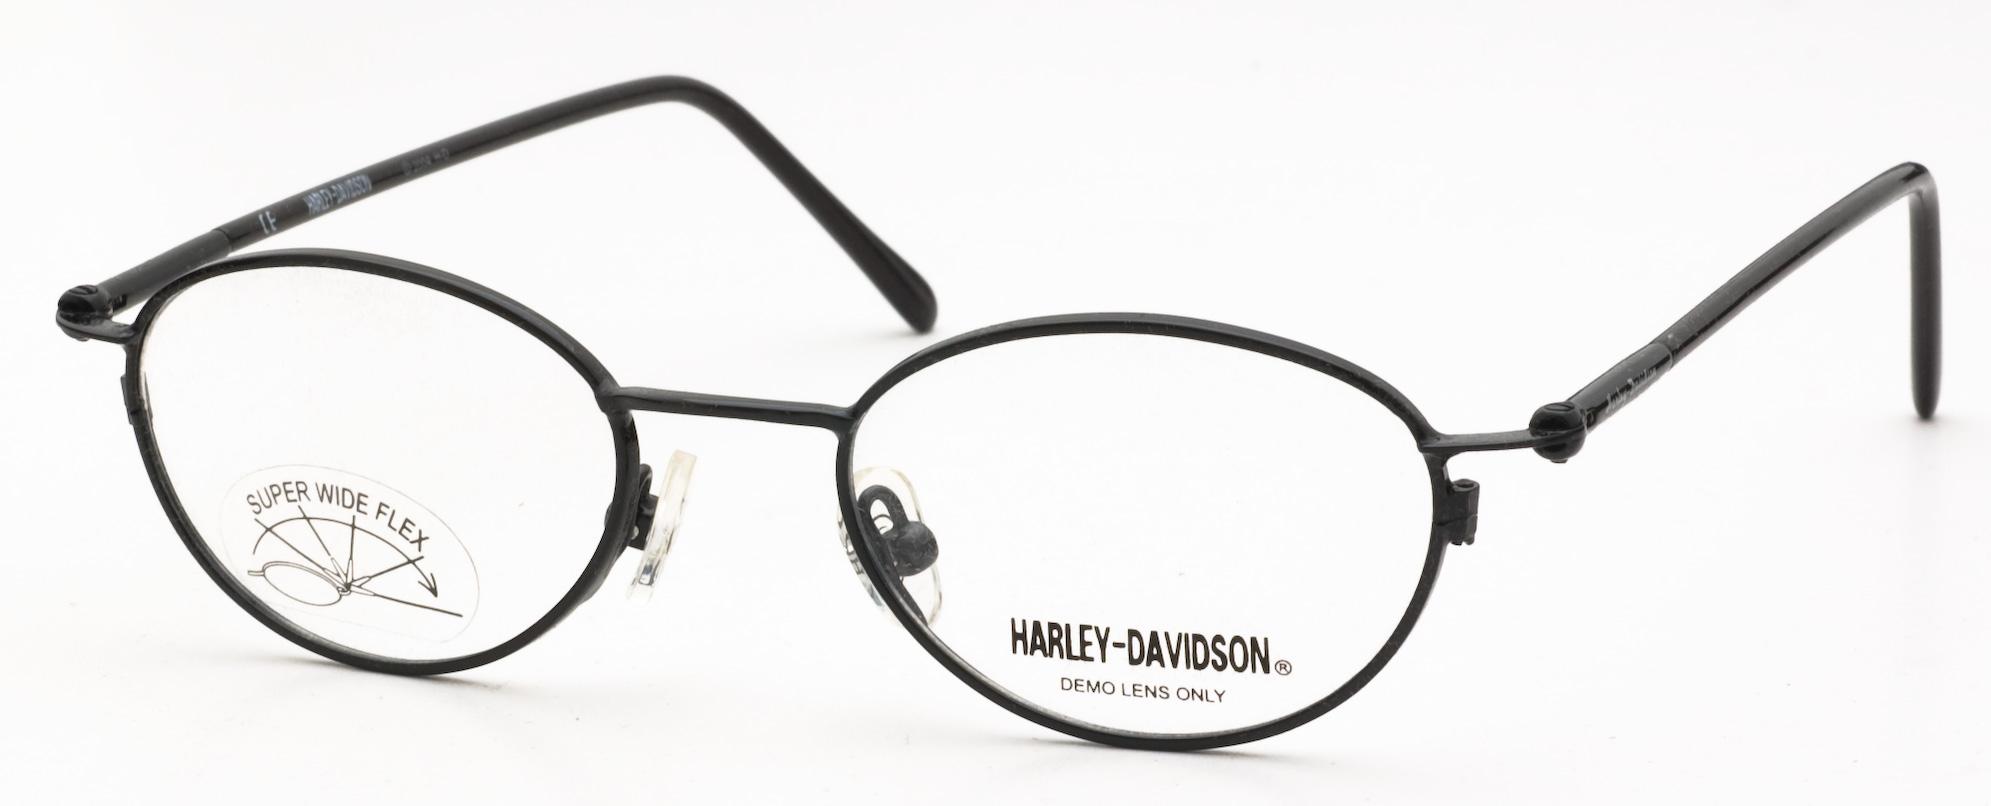 Harley Davidson Sun Glasses Eye Glasses Oakley Sun